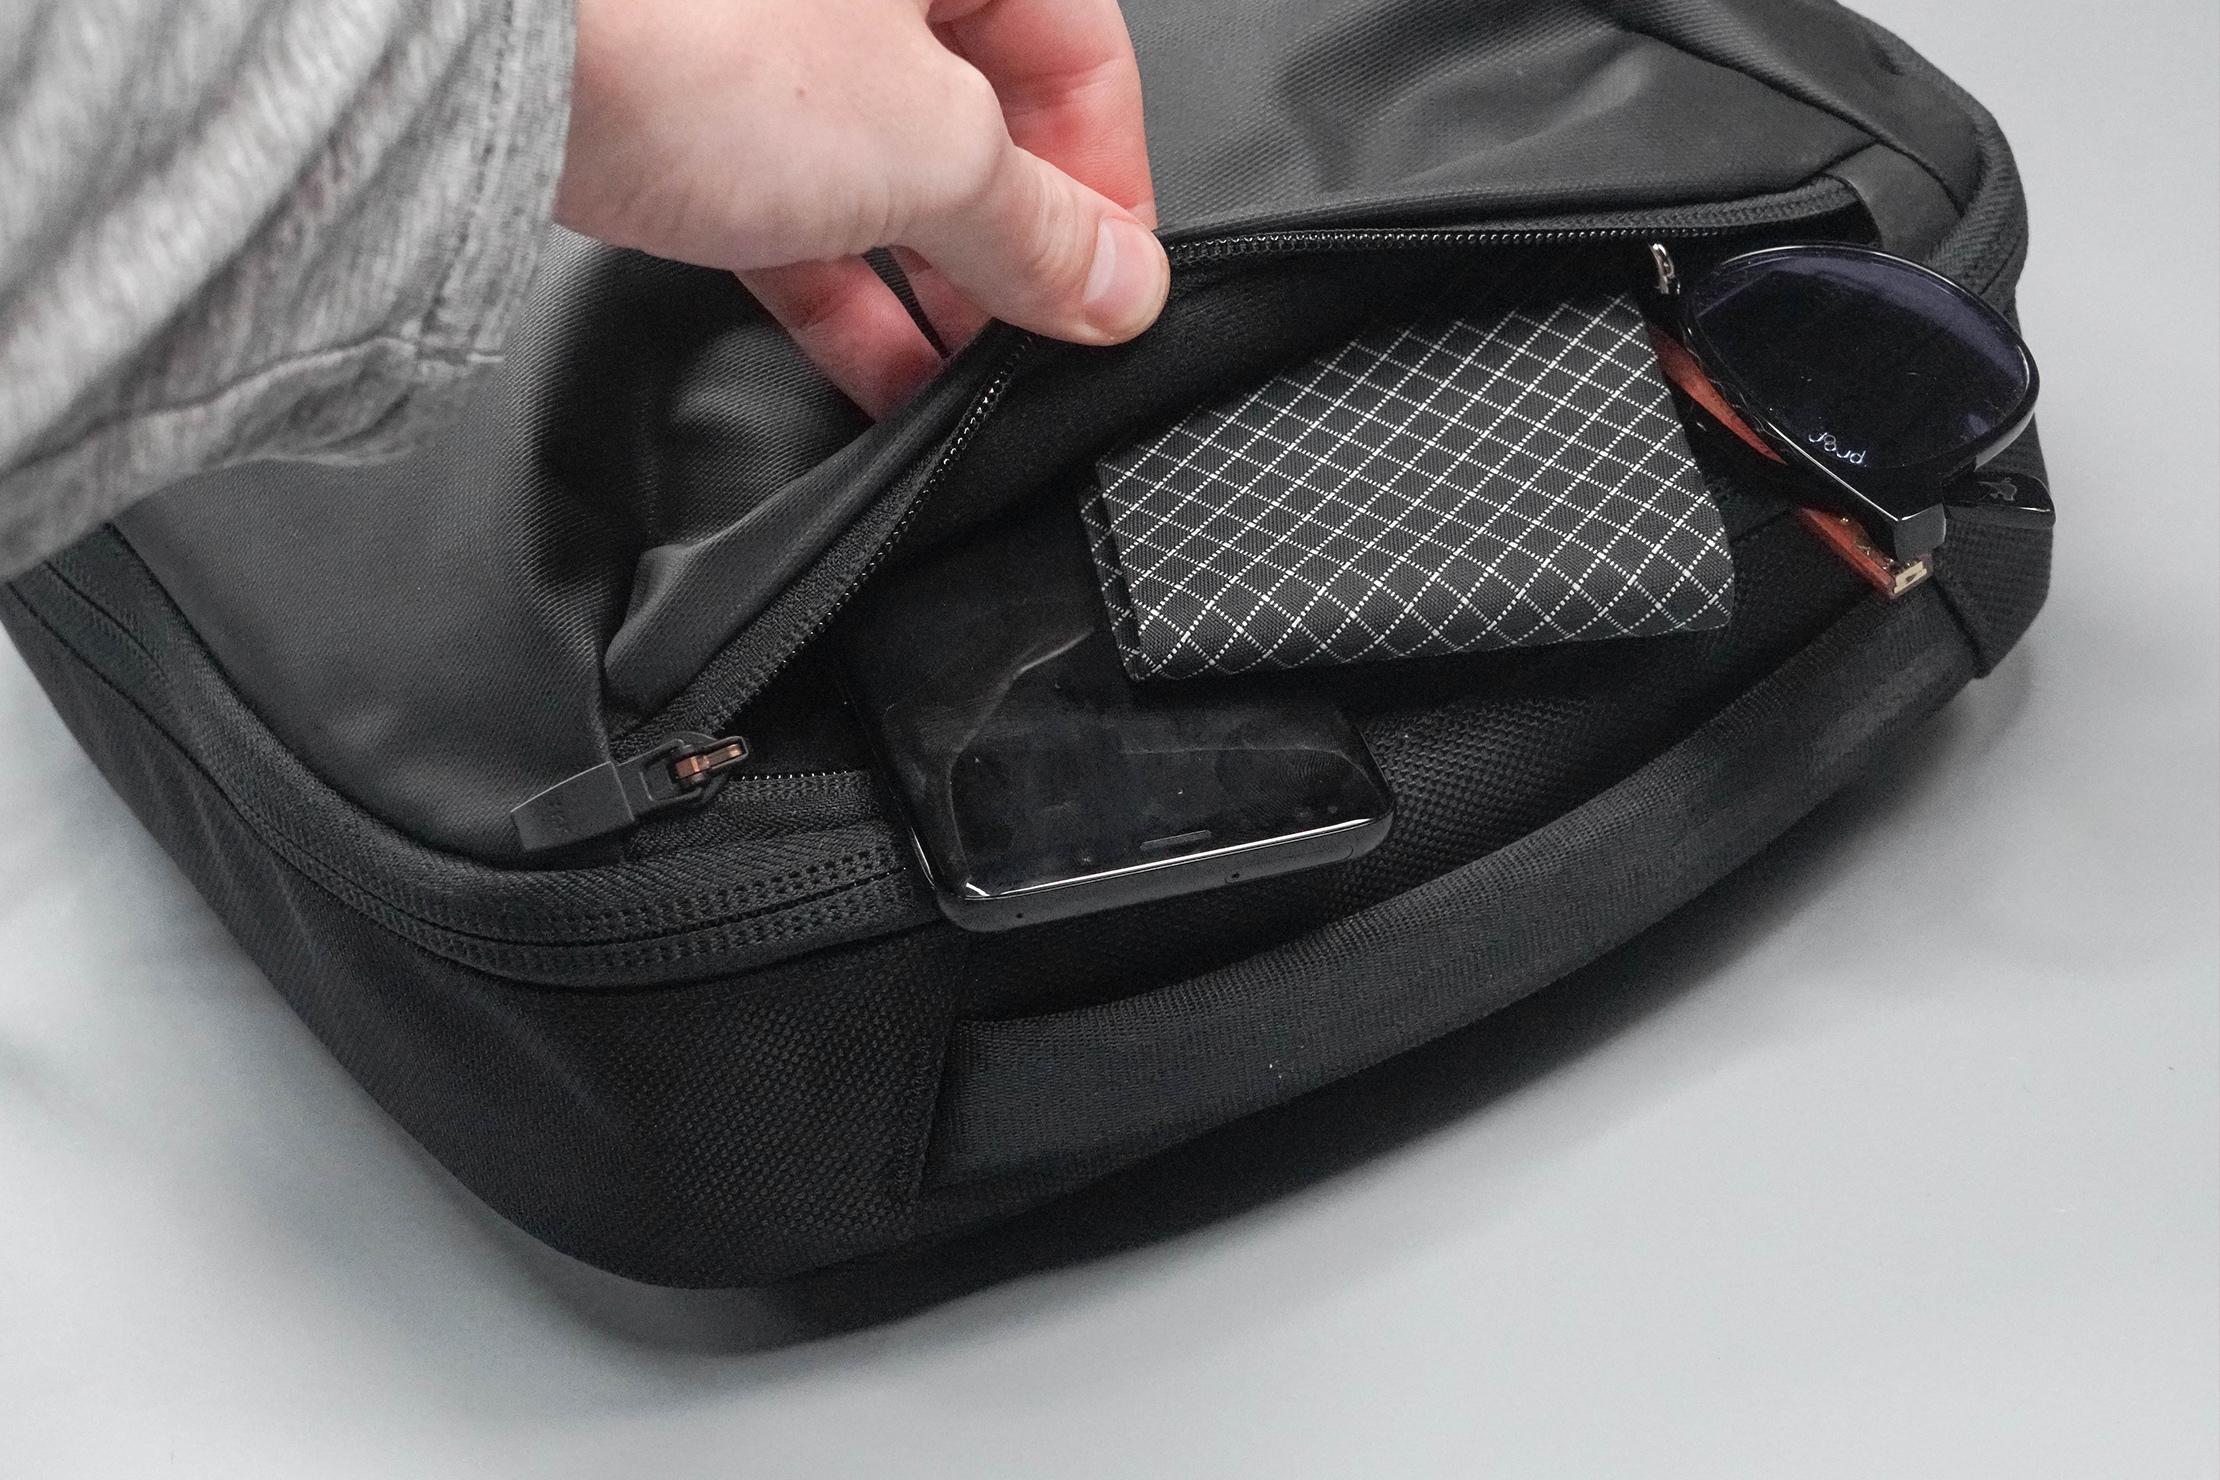 Aer Slim Pack Quick-Grab Pocket